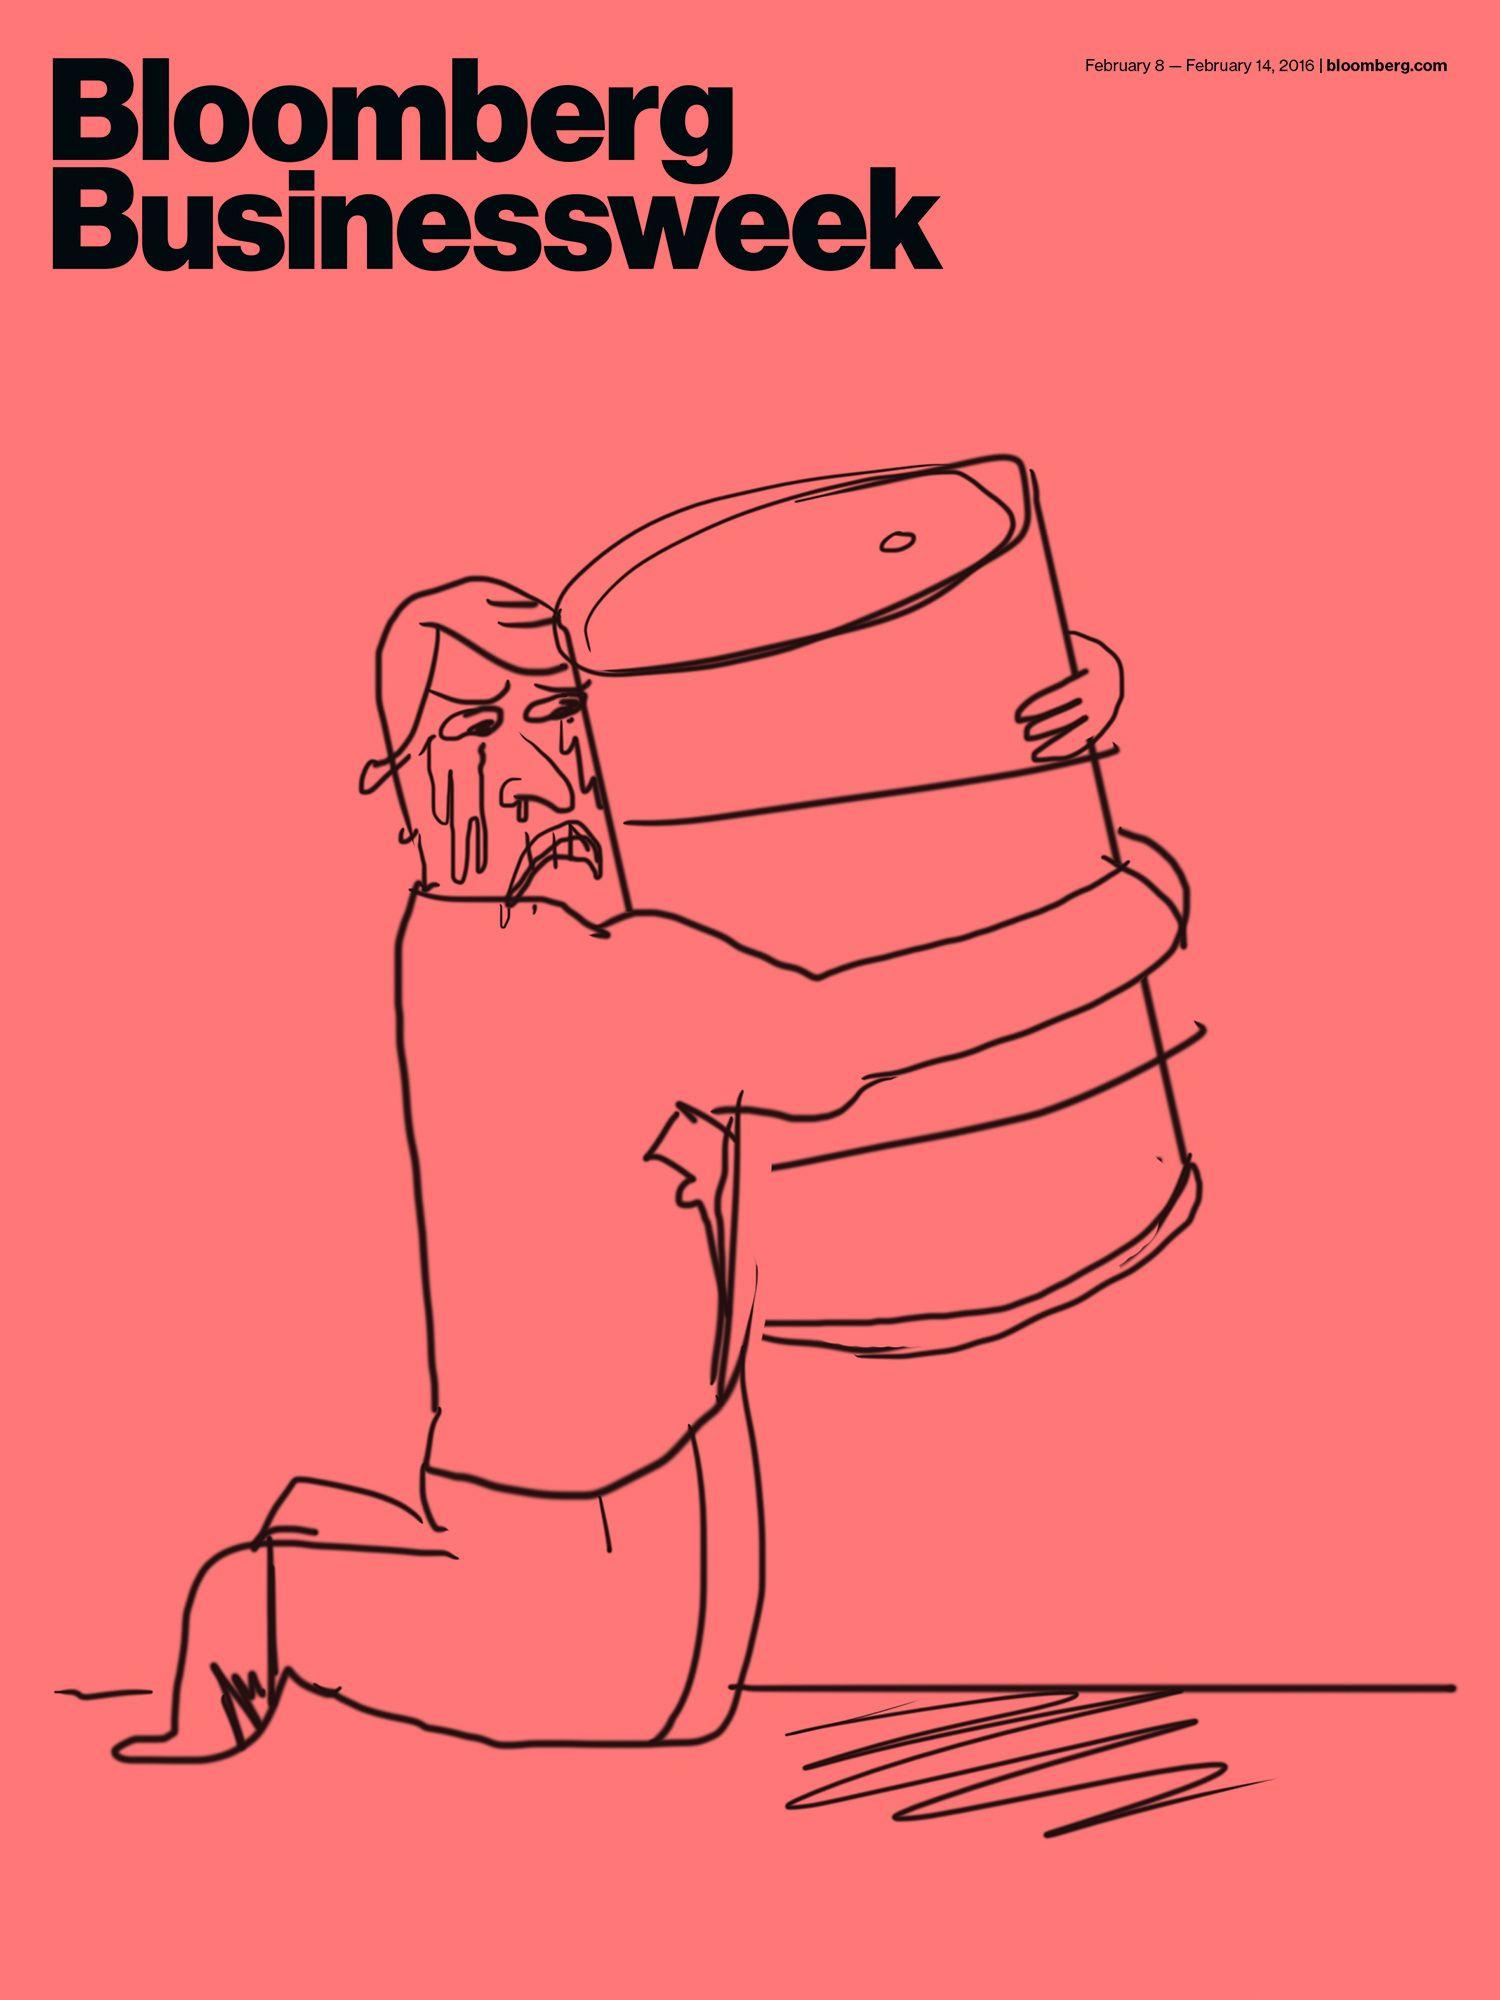 Bloomberg Businessweek cover valentines - Bráulio Amado